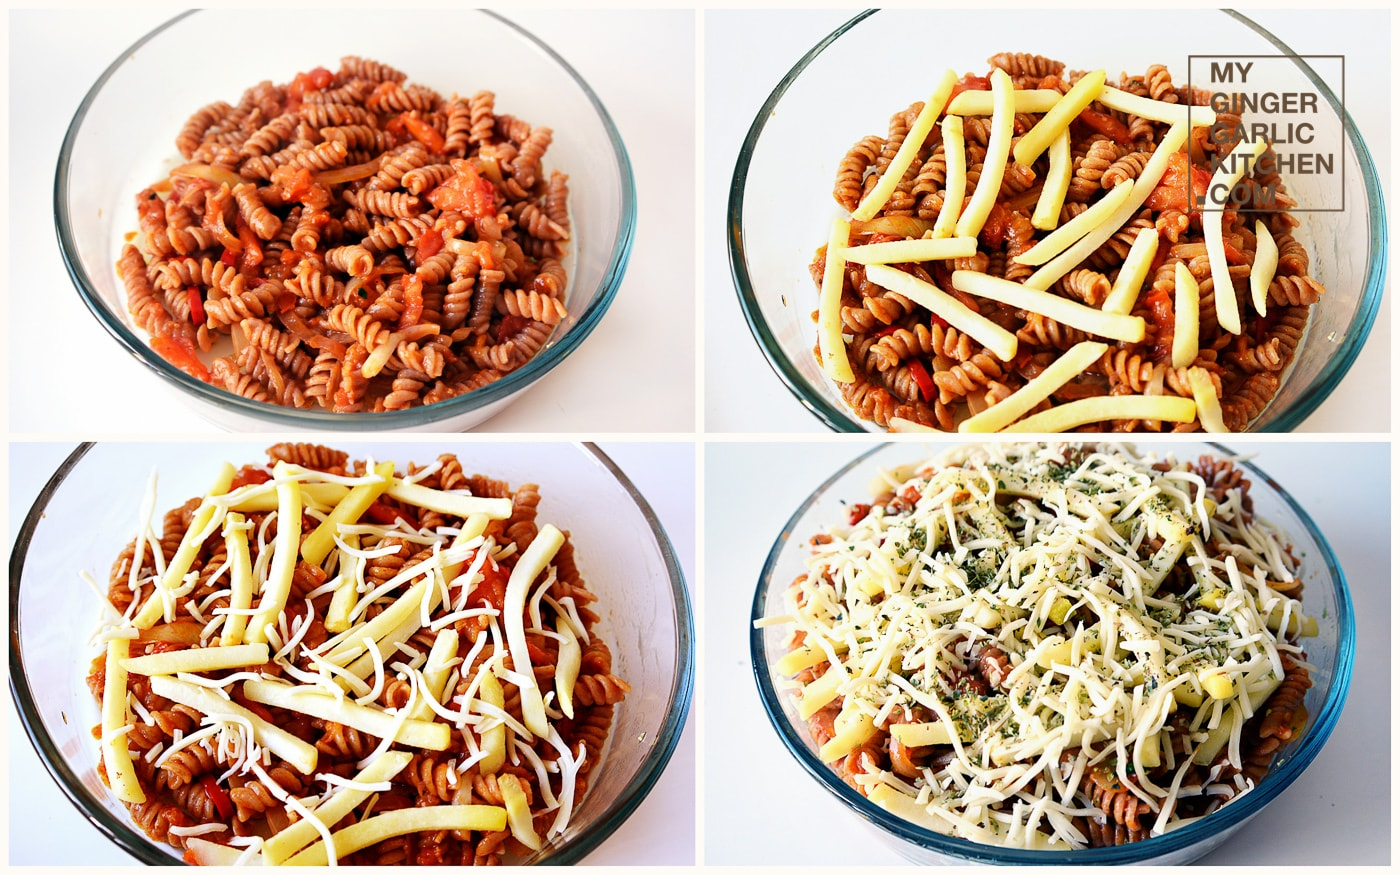 recipe-garlic-potato-pasta-casserole-anupama-paliwal-my-ginger-garlic-kitchen-12